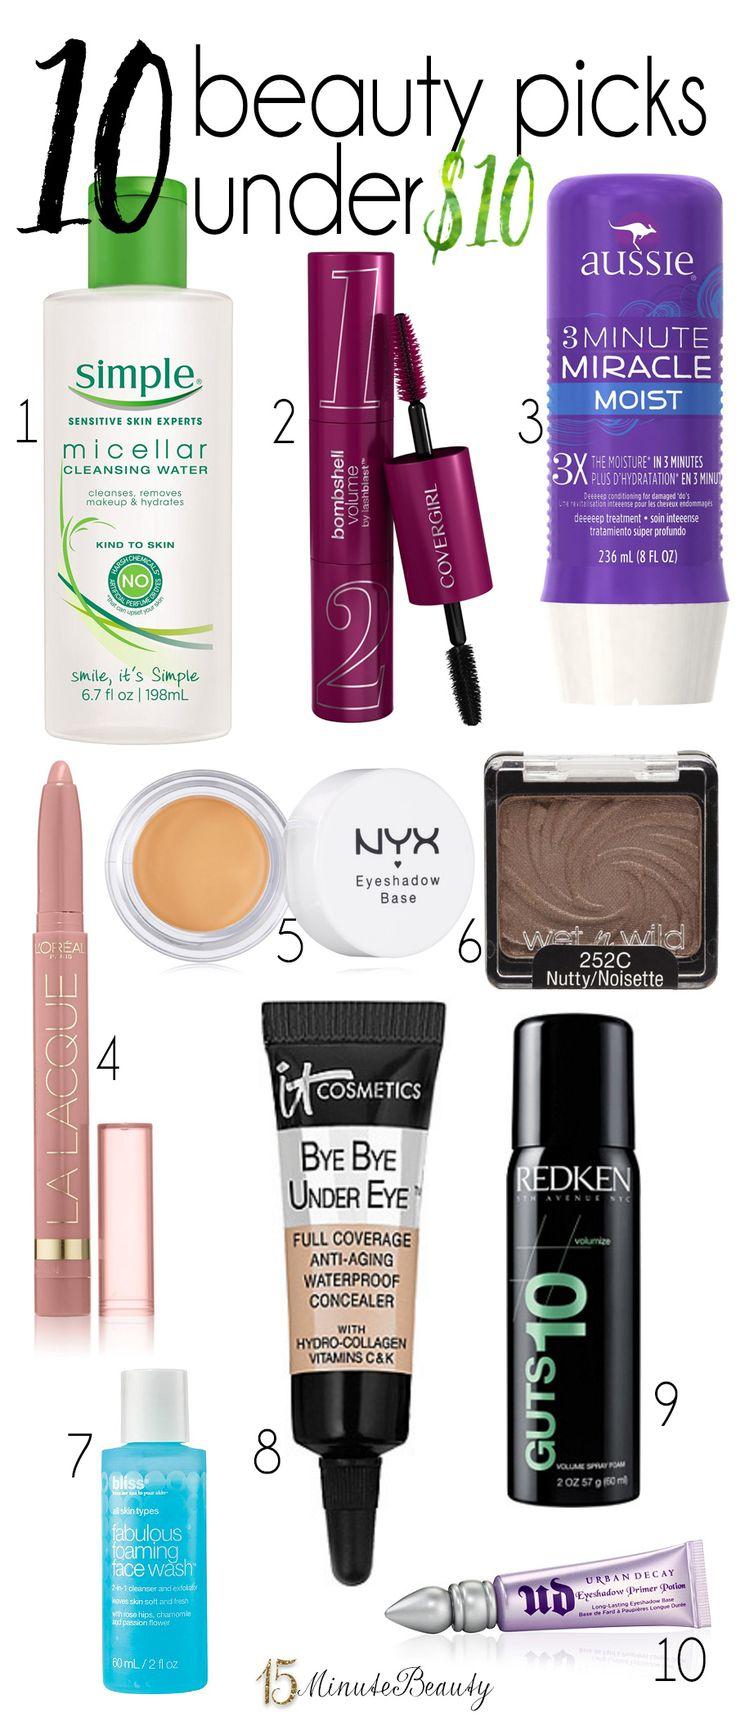 10 Beauty Picks Under $10